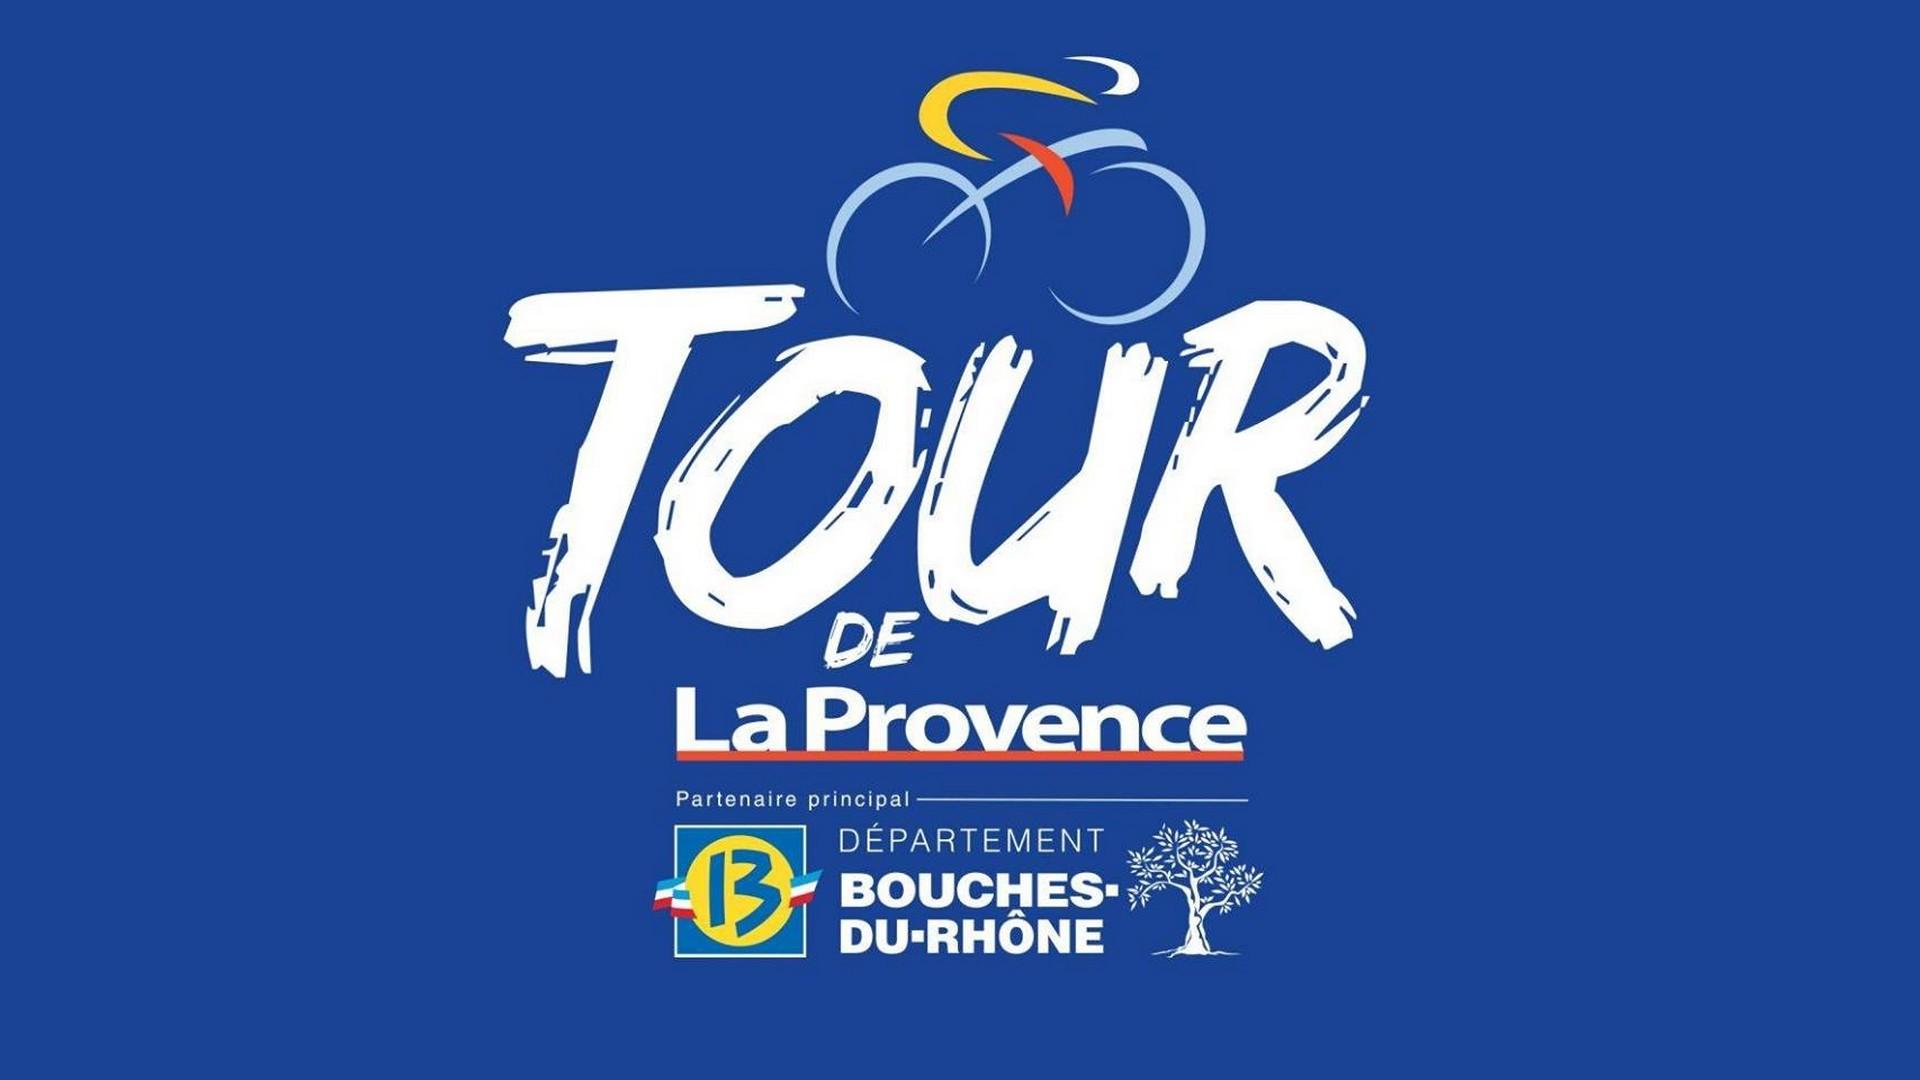 Cyclisme – Tour de la Provence (1) Logo